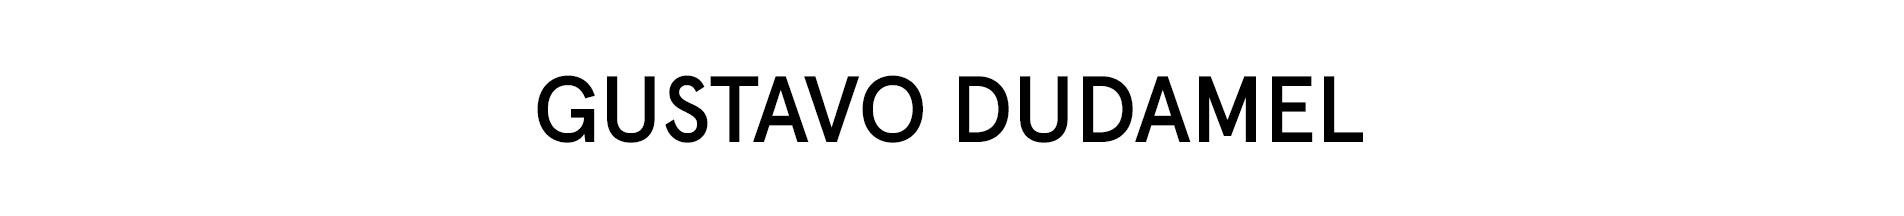 Dudamel